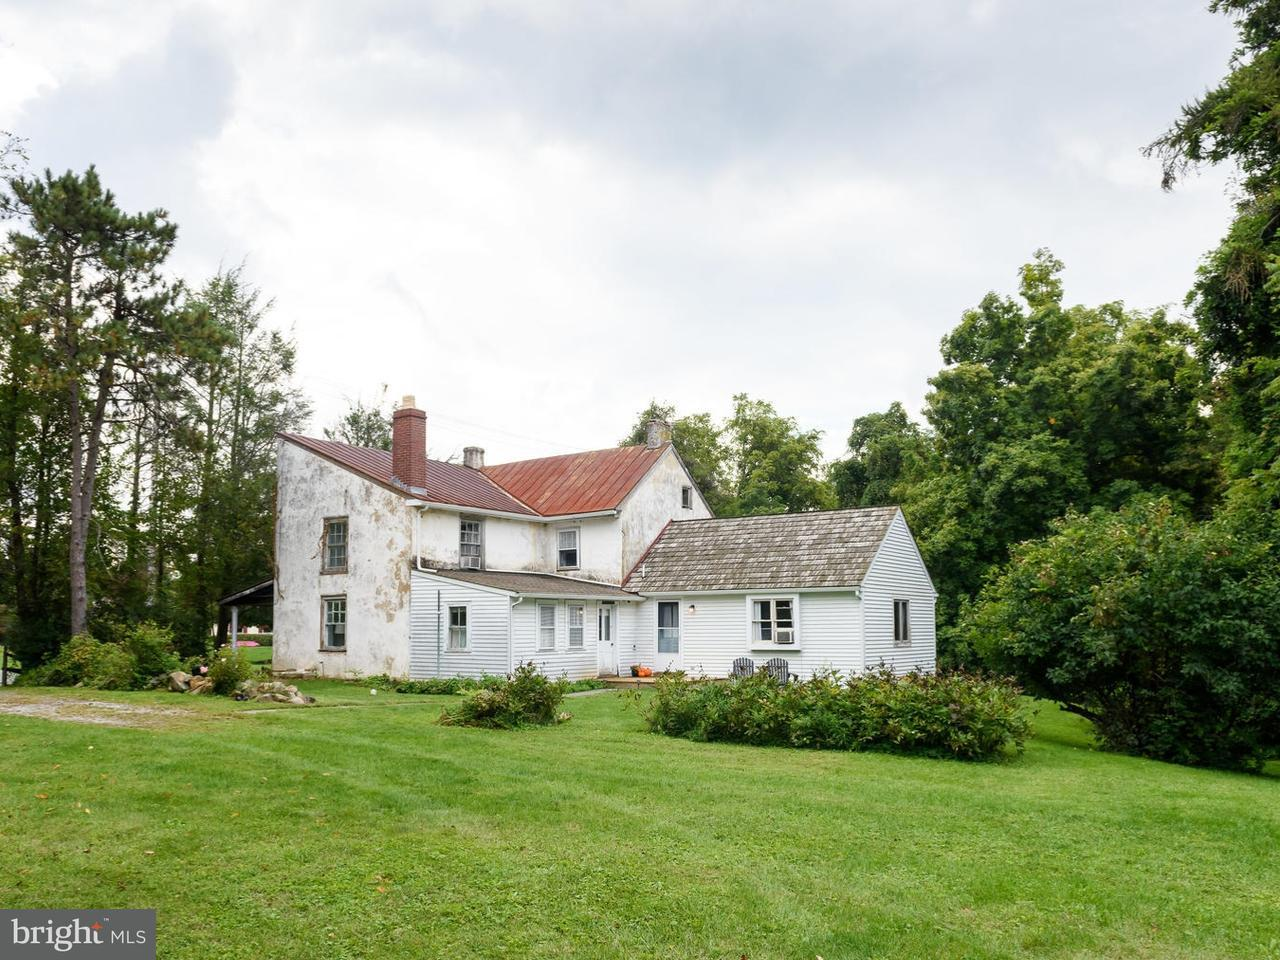 Single Family Home for Sale at 1101 LITTLE CONESTOGA Road Glenmoore, Pennsylvania 19343 United States